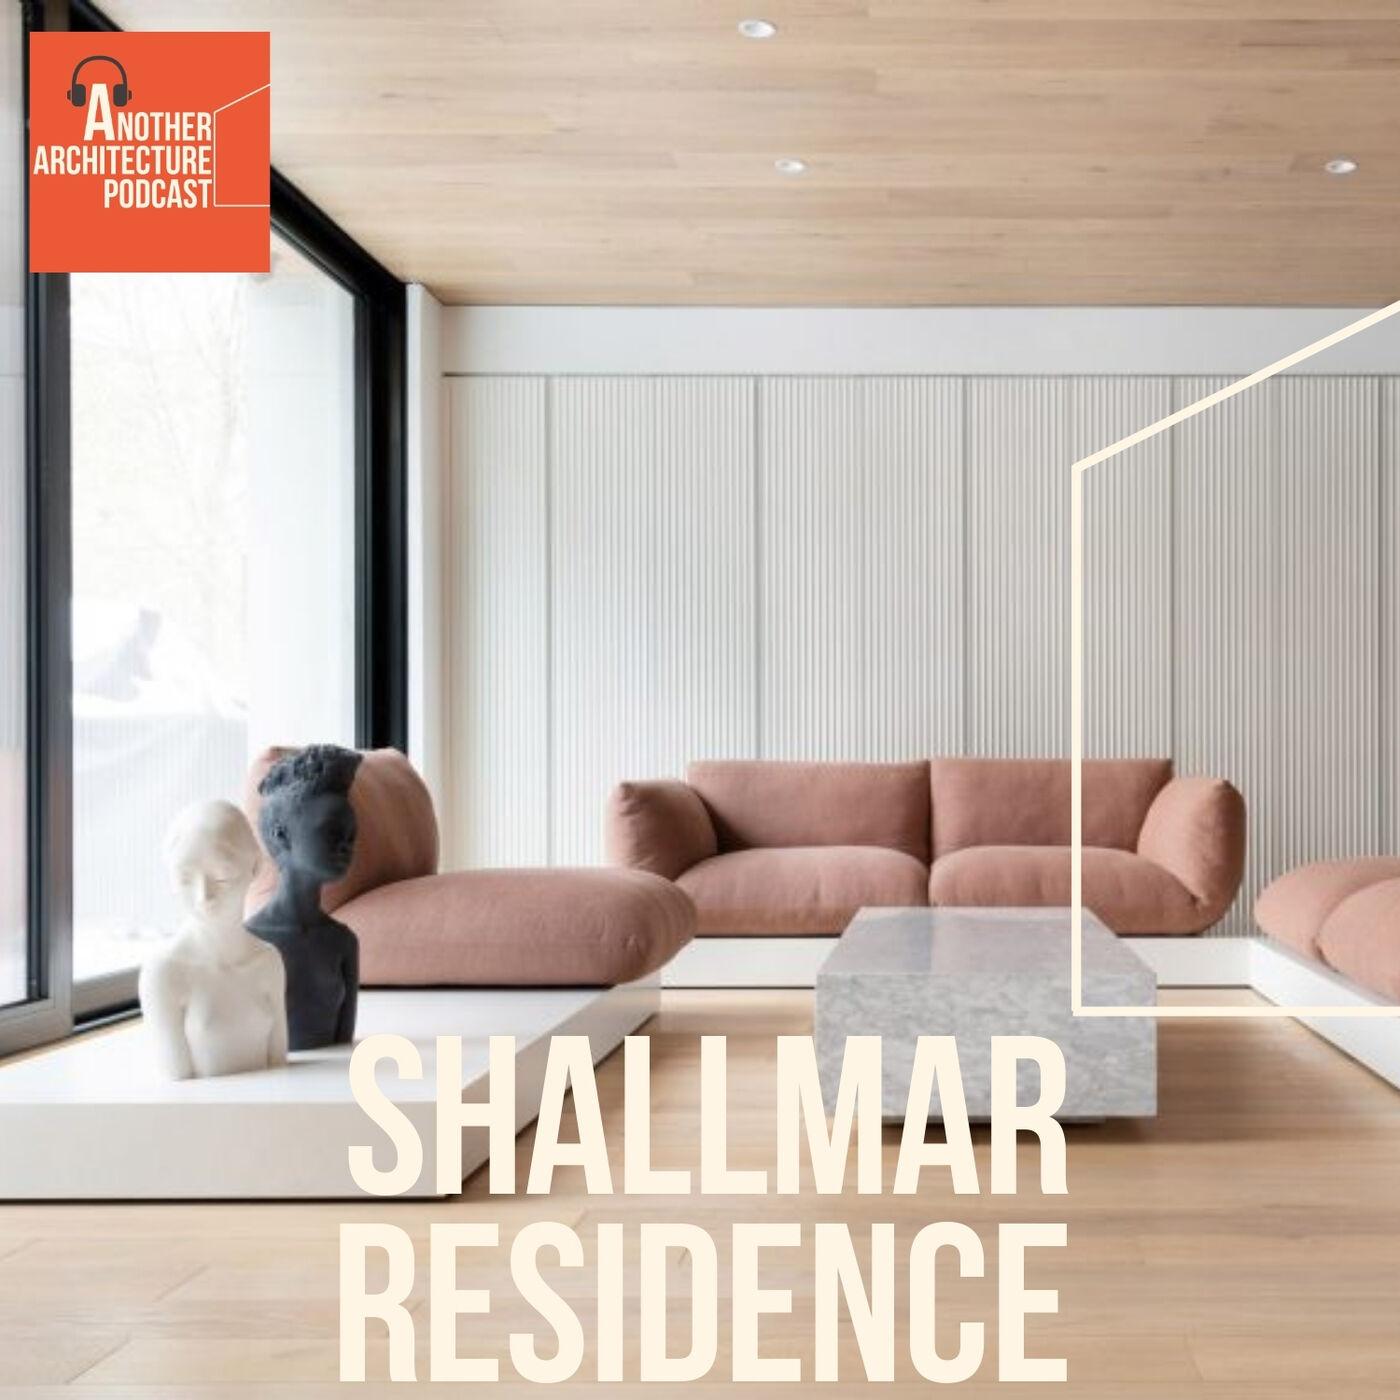 Shallmar Residence with Studio A/C